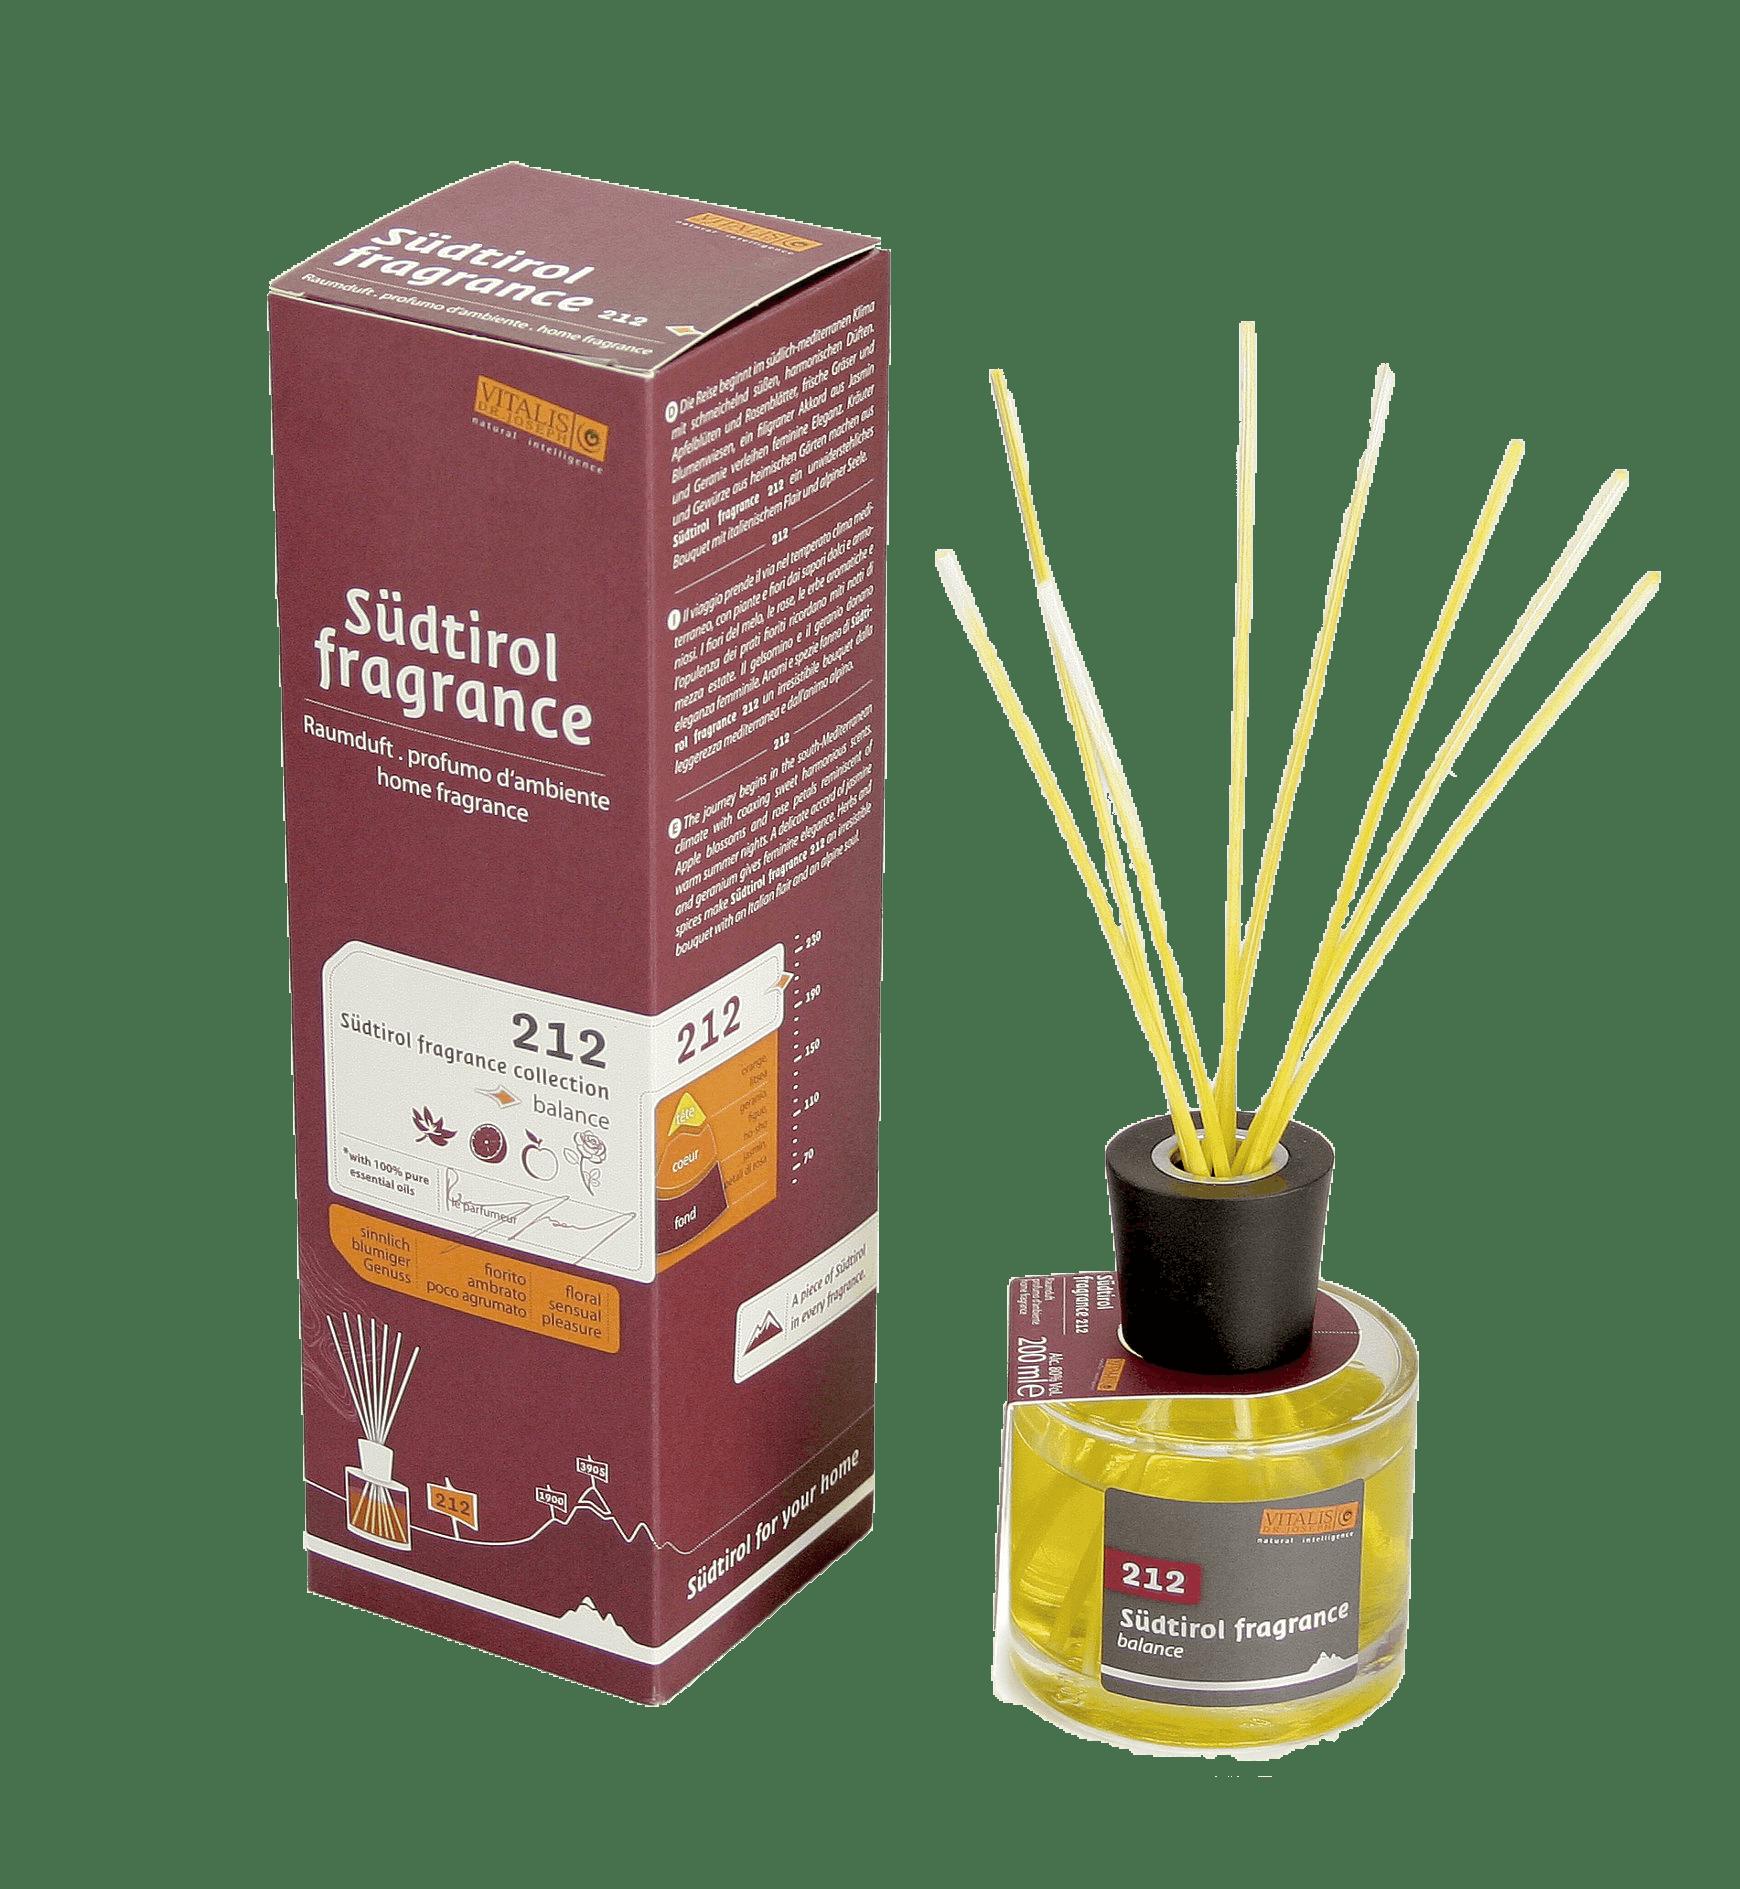 Vitalis Dr. Joseph Südtirol Fragrance 212 - profumo per ambienti naturale